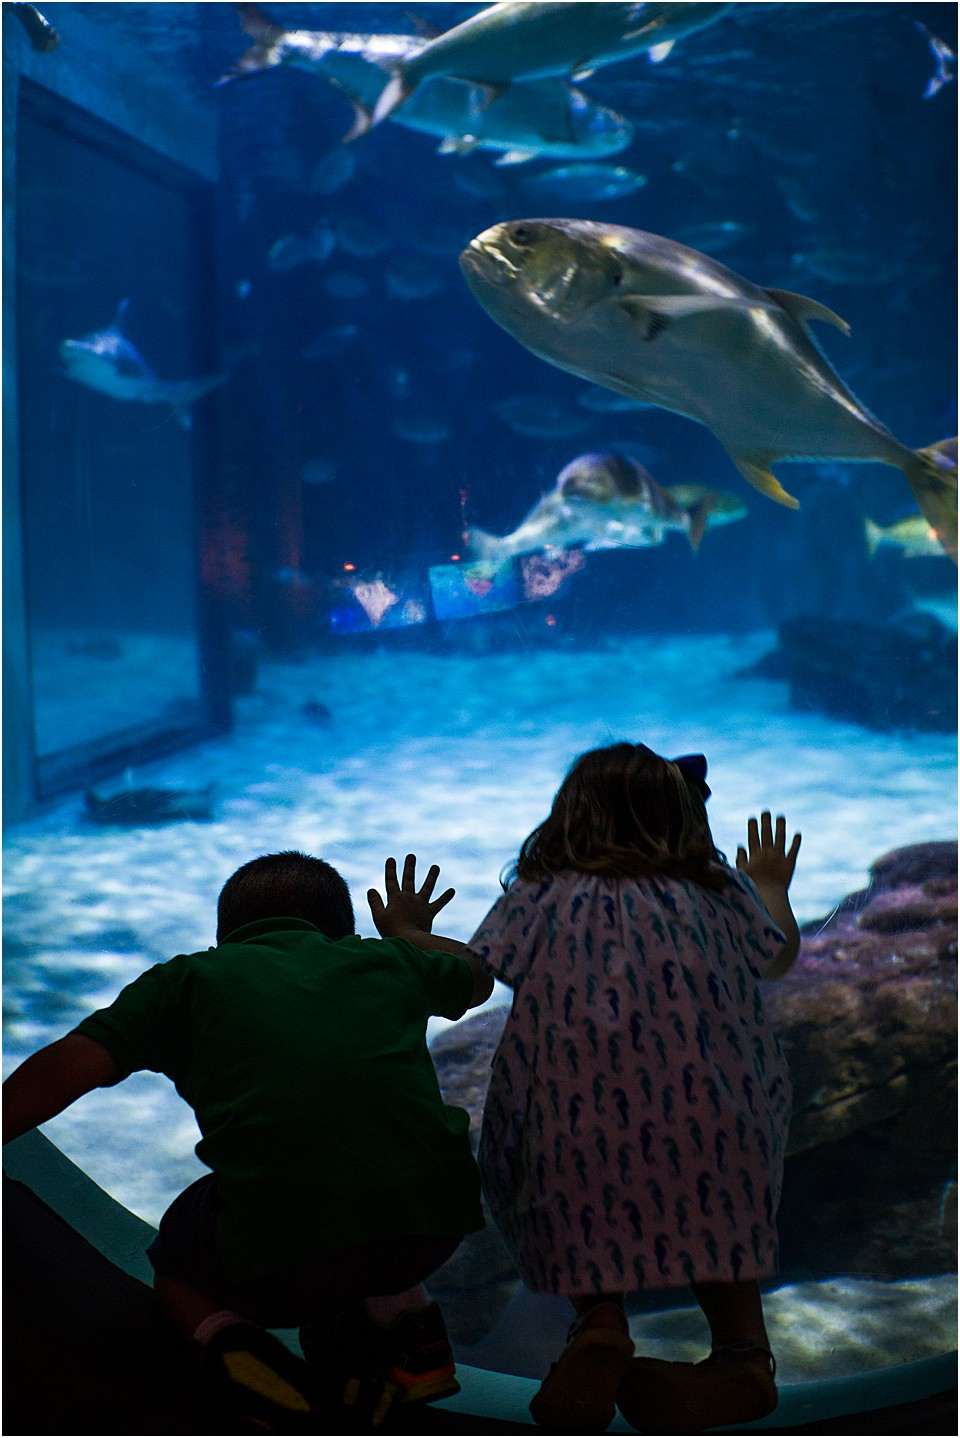 watching the stingrays at the aquarium